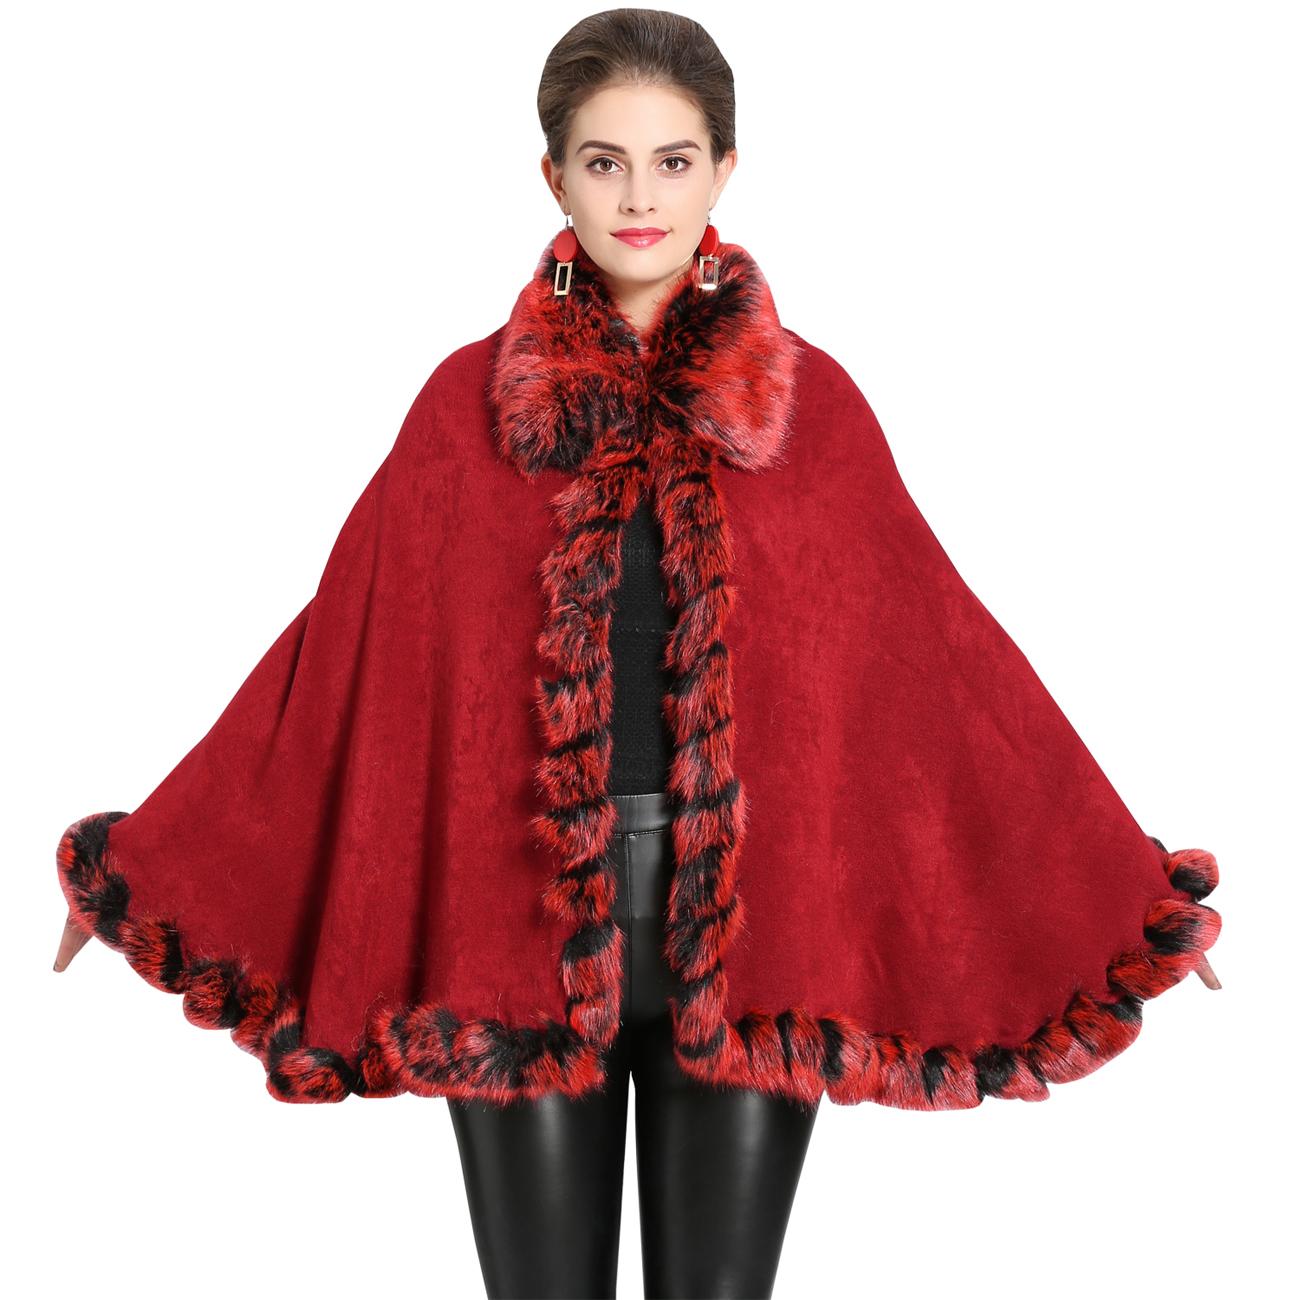 Winter Women/'s Faux Fox Fur Cape Shawl Wedding Party Wrap Poncho Jackets Outwear